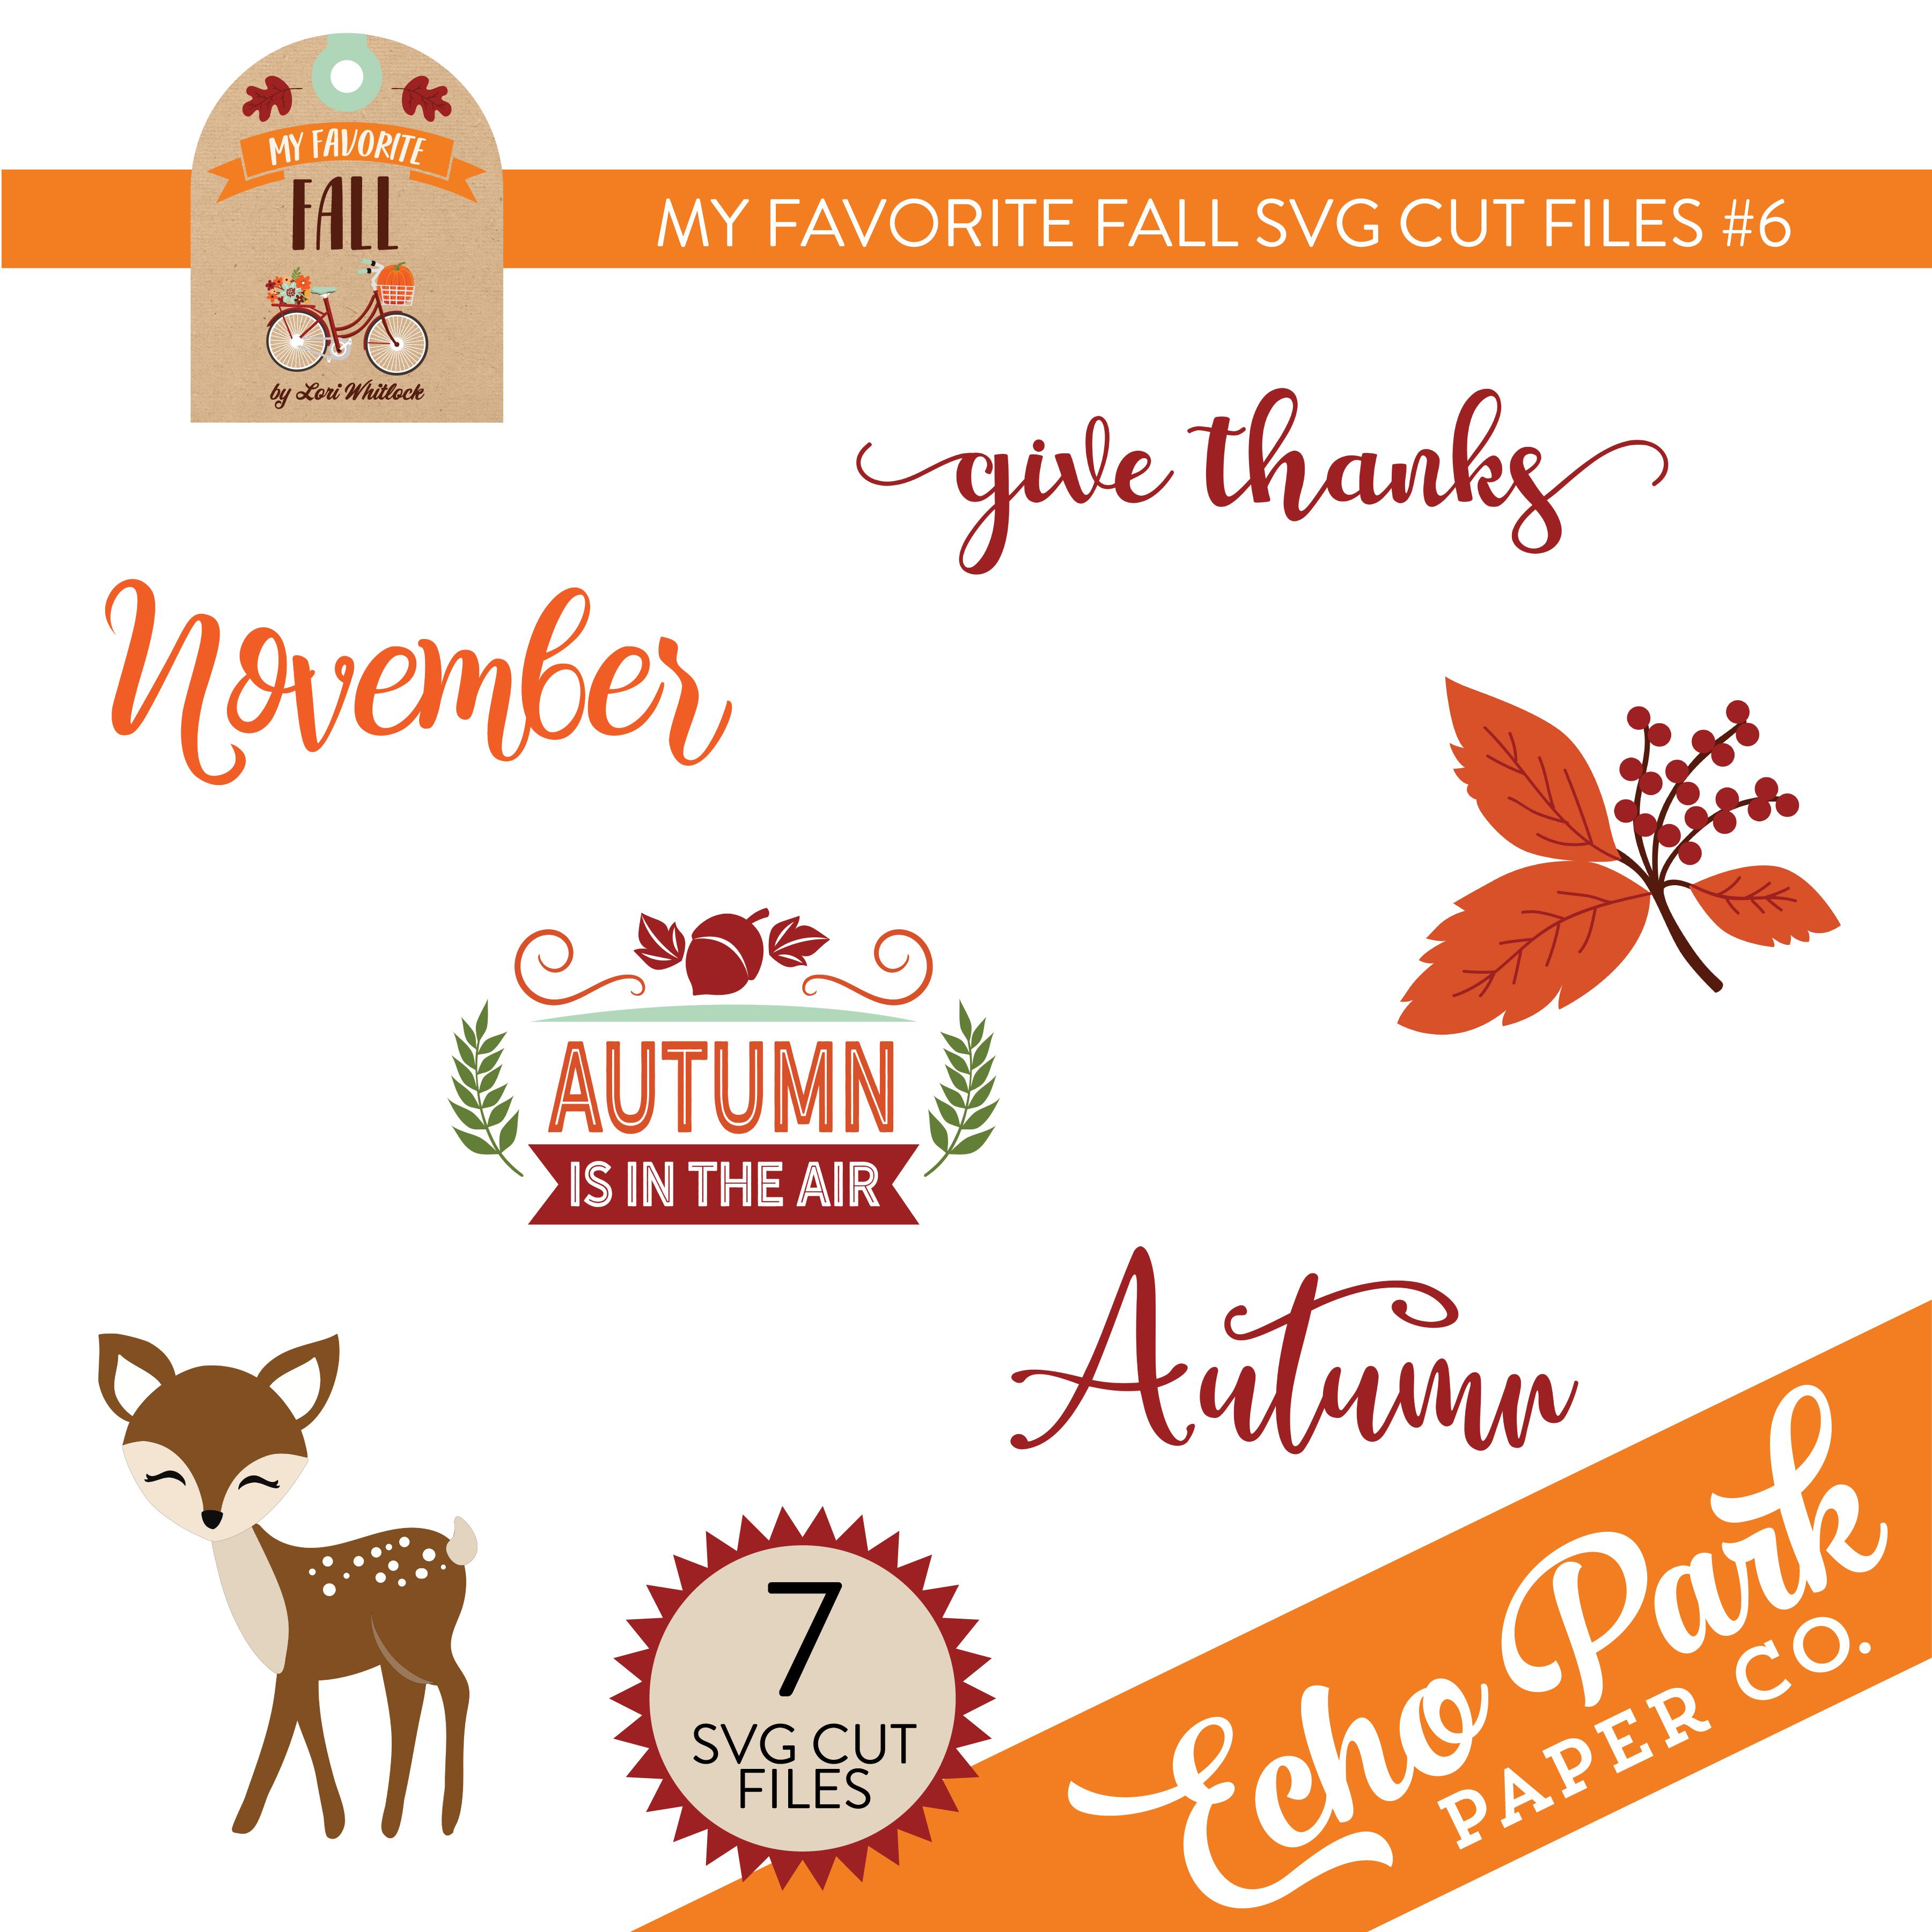 My Favorite Fall SVG Cut Files #6